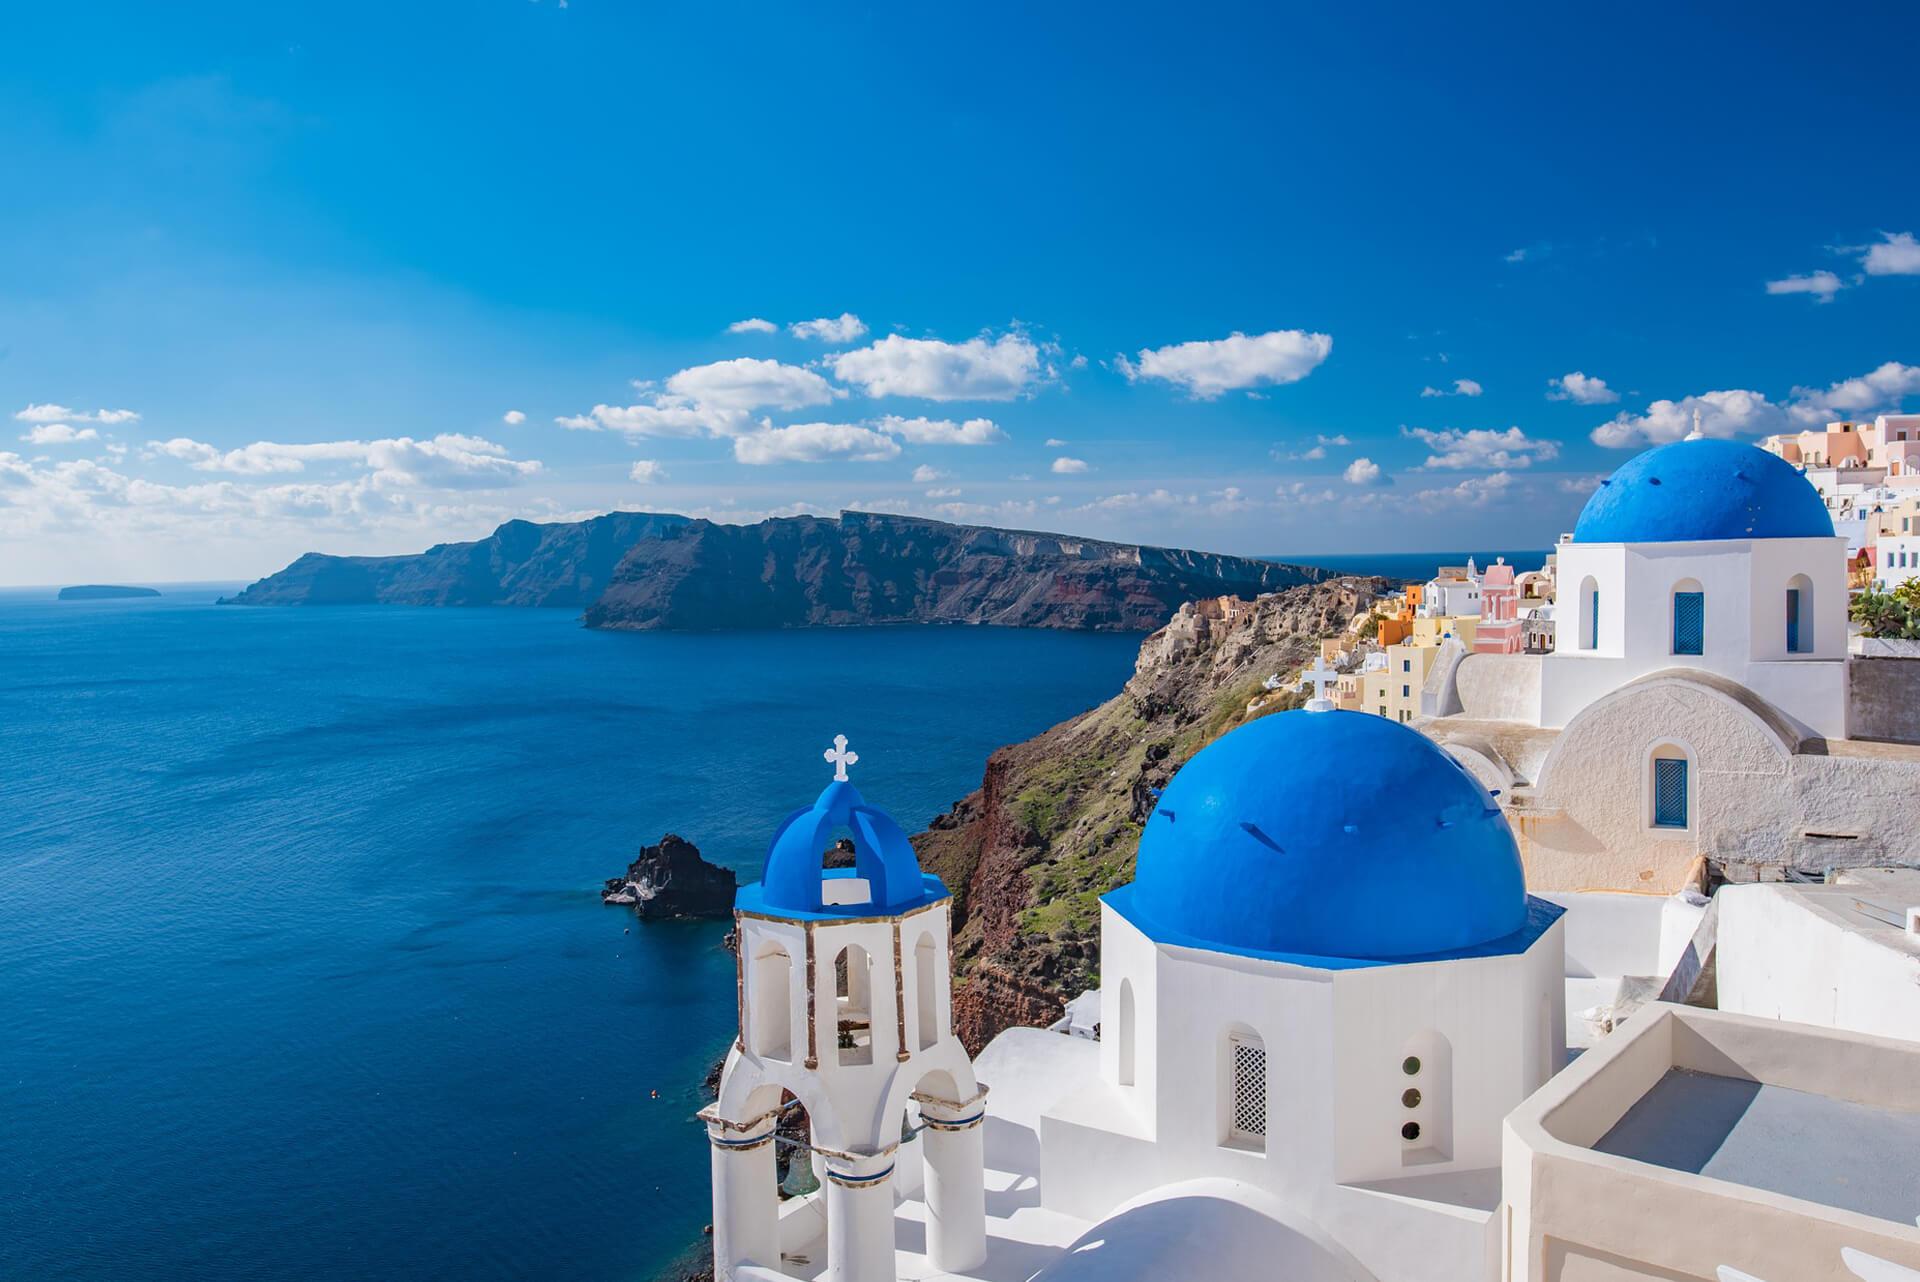 Cyclades | Santorini Breathtaking Views